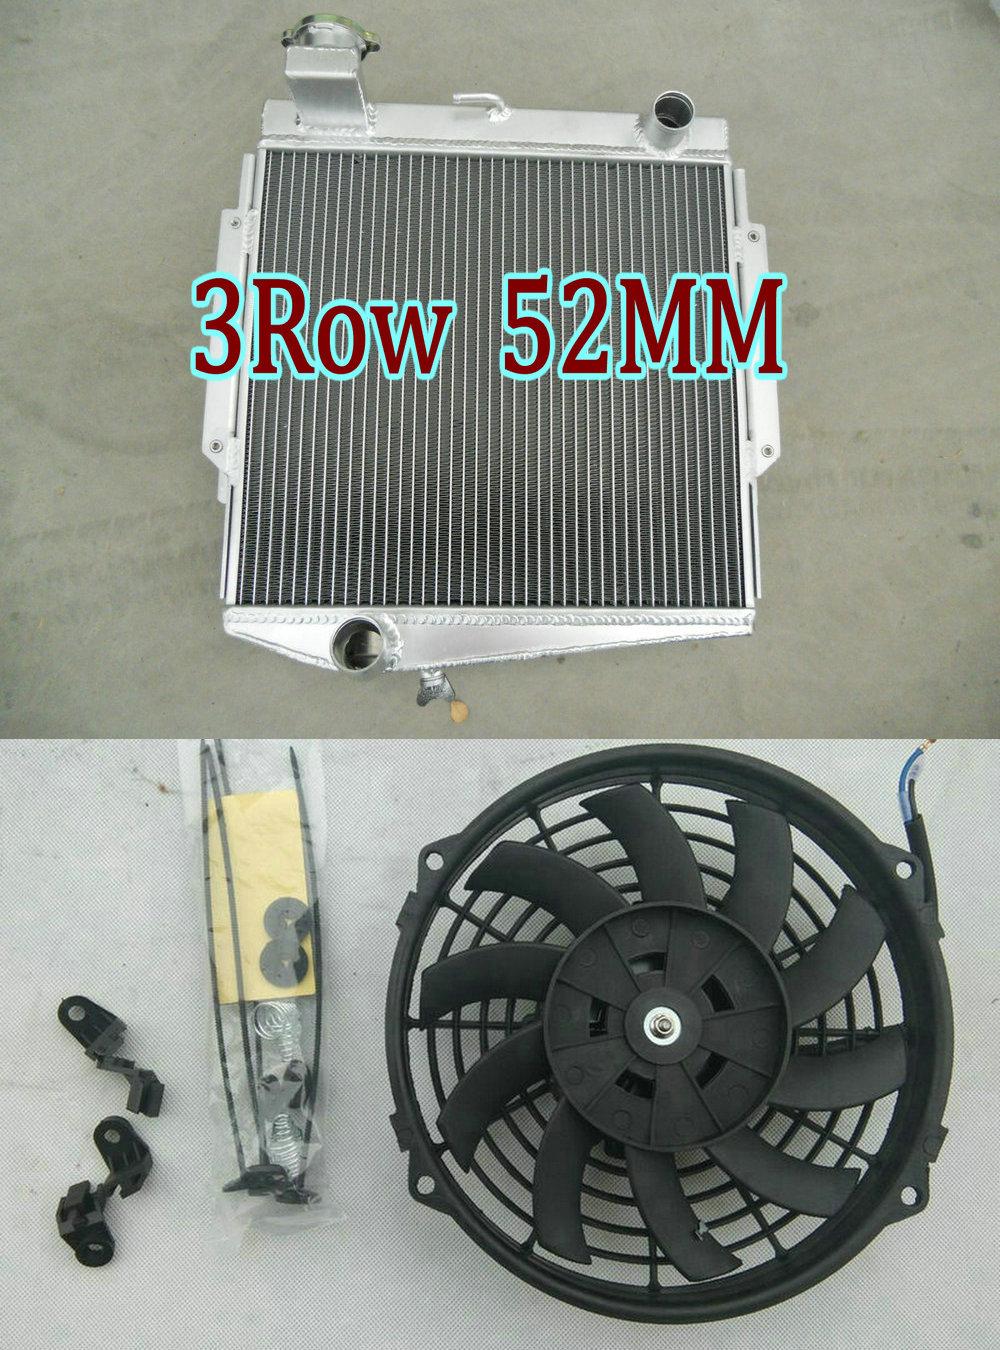 Fan for 1966-1970 Datsun Roadster Fairlady 67 68 69 70 3 ROW Aluminum Radiator